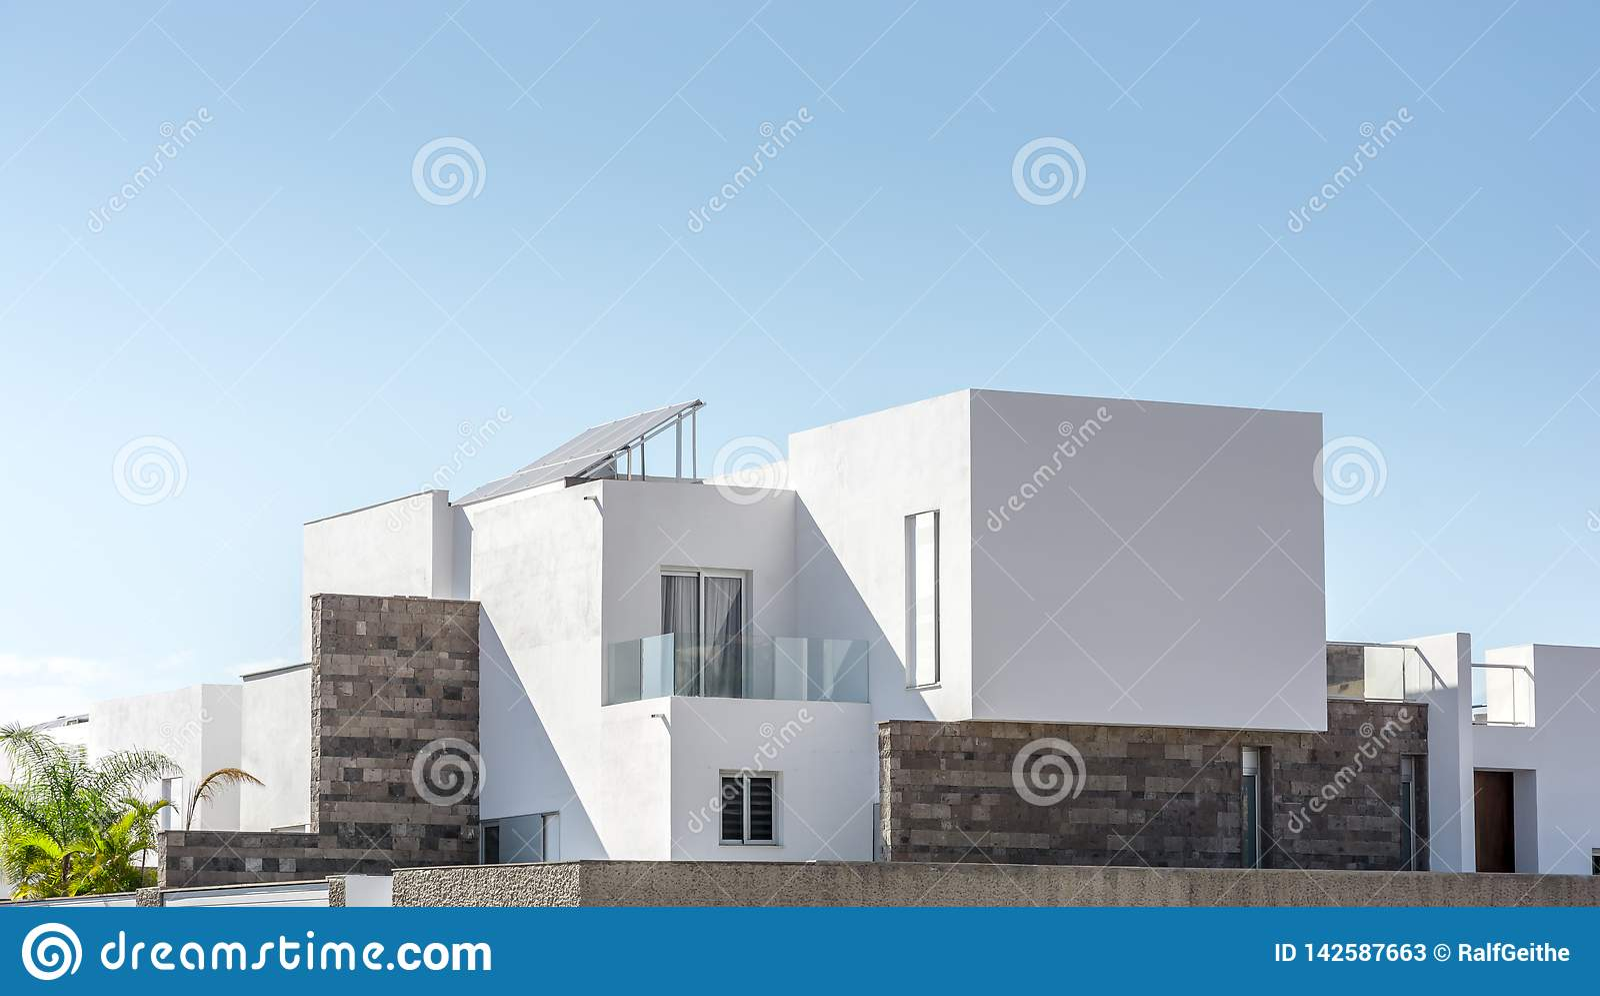 Lyxigt bostads- hus med modern arkitektur framme av solig himmel